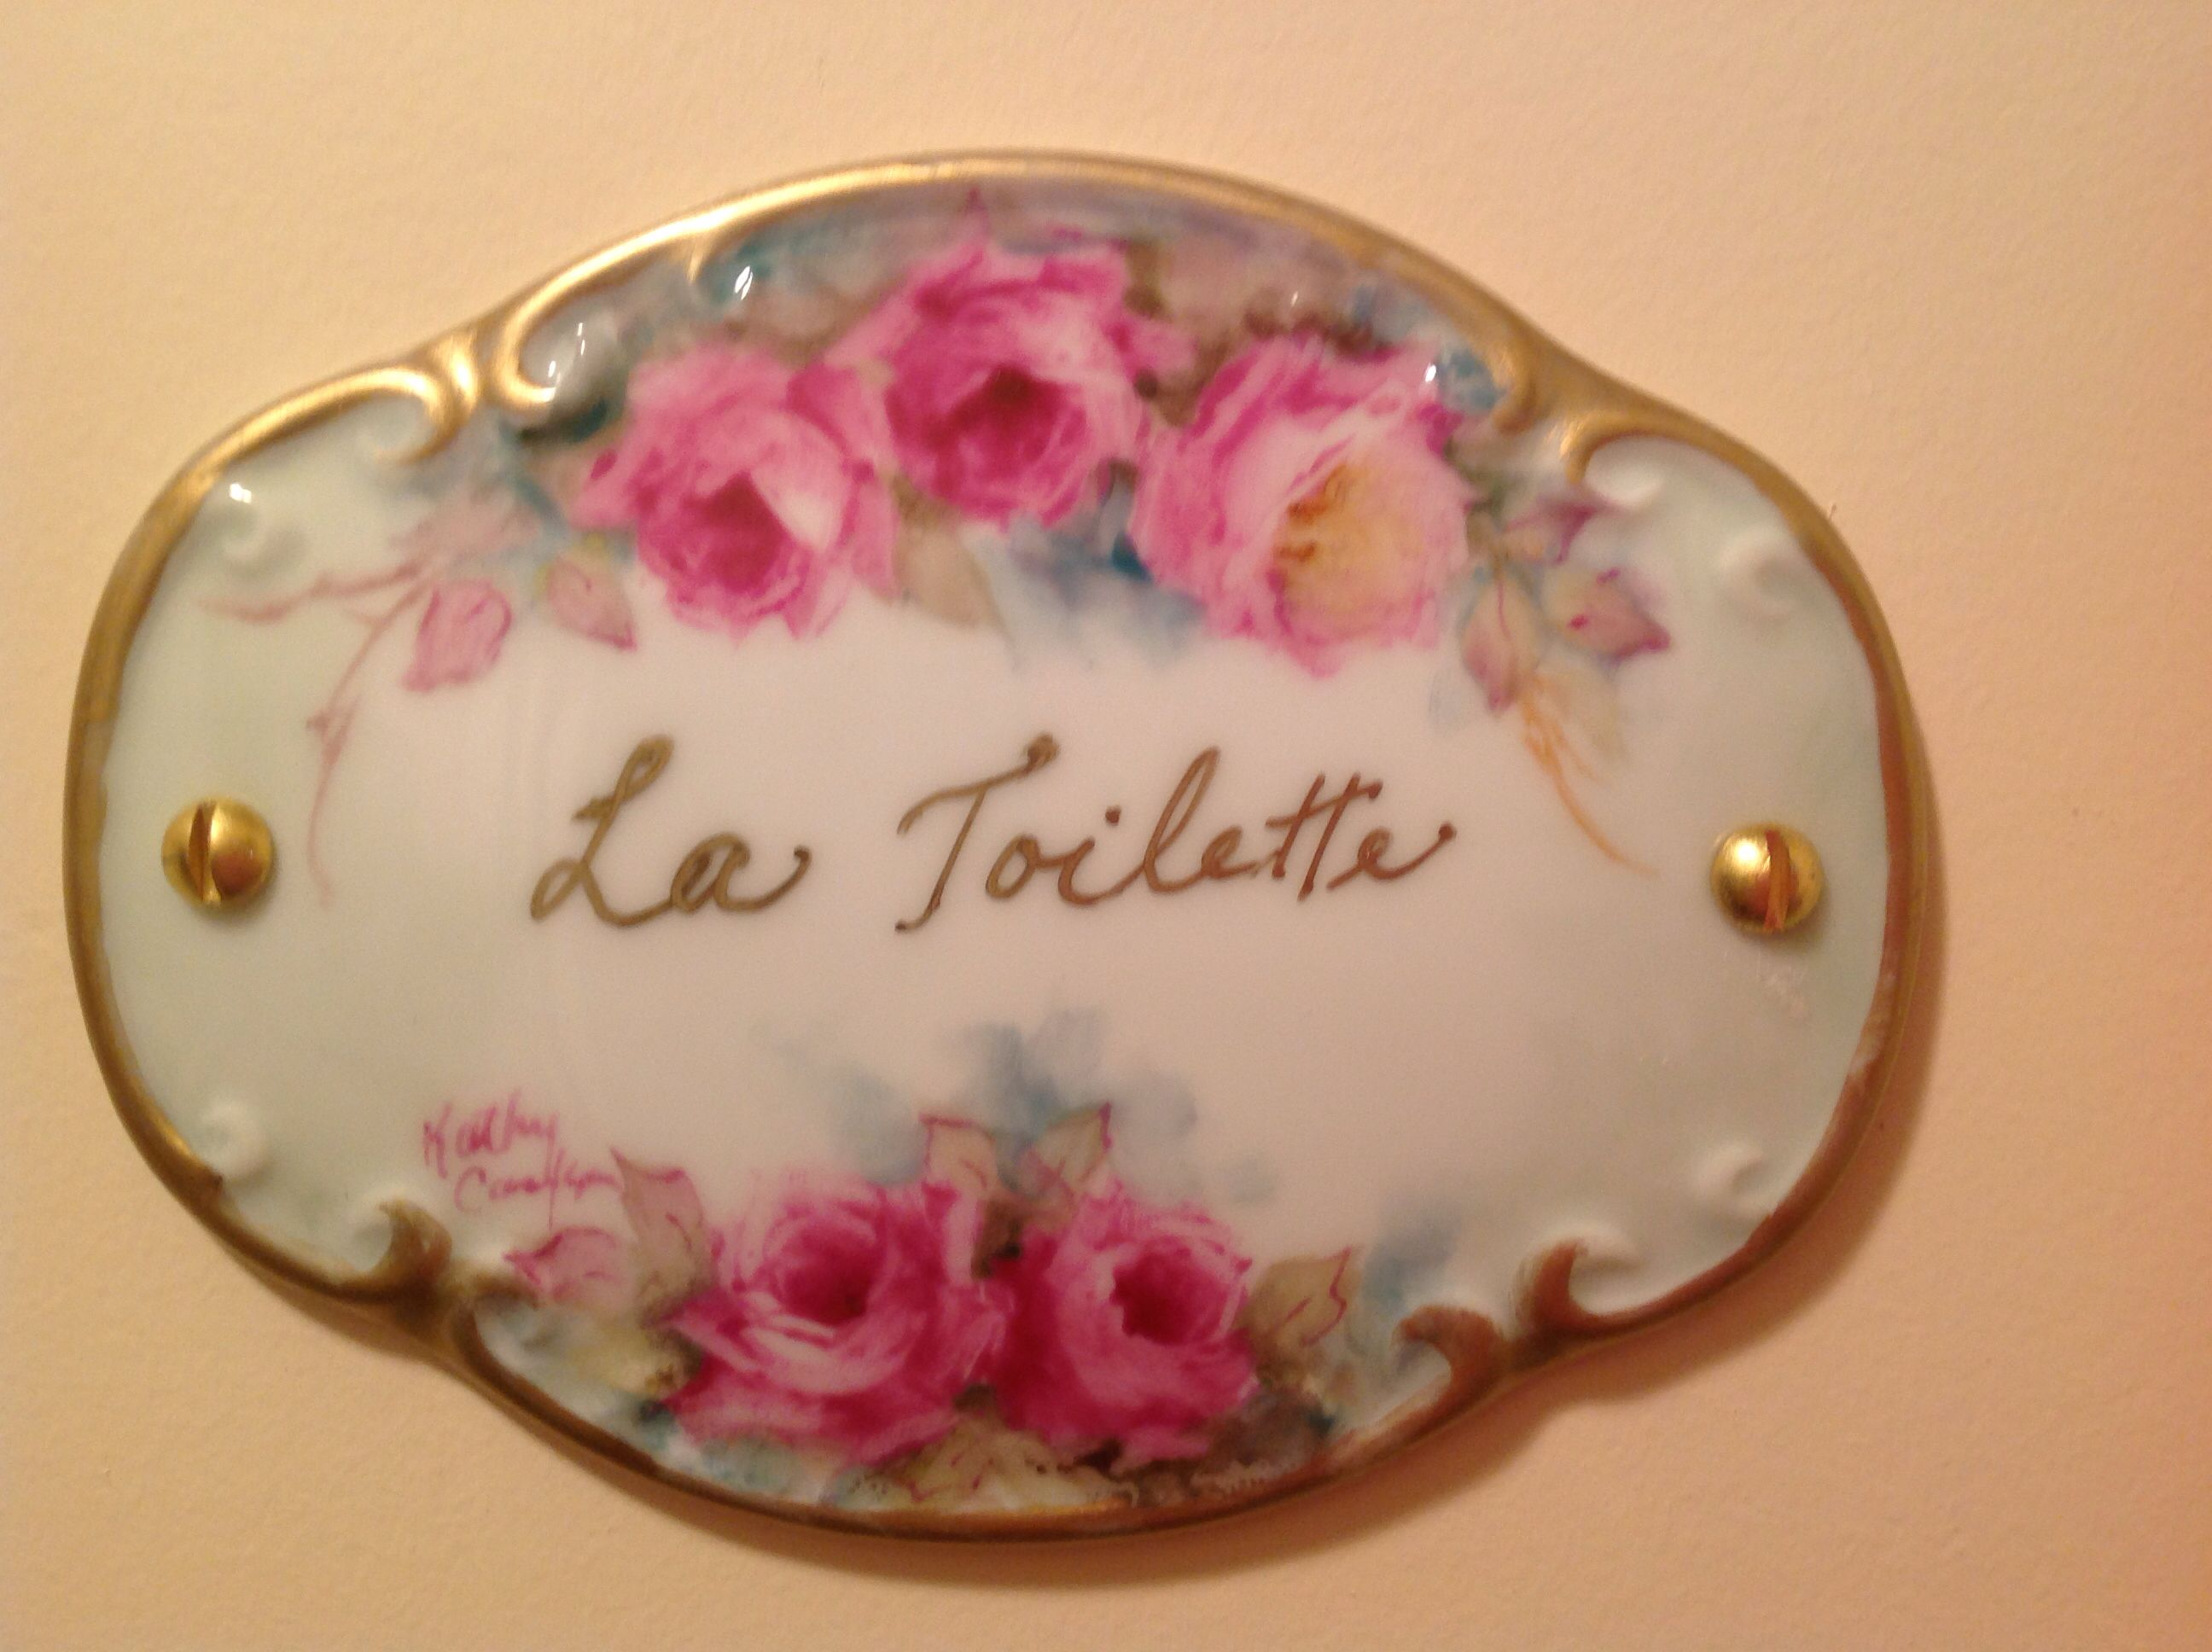 I painted this for my bathroom door pintura em porcelana